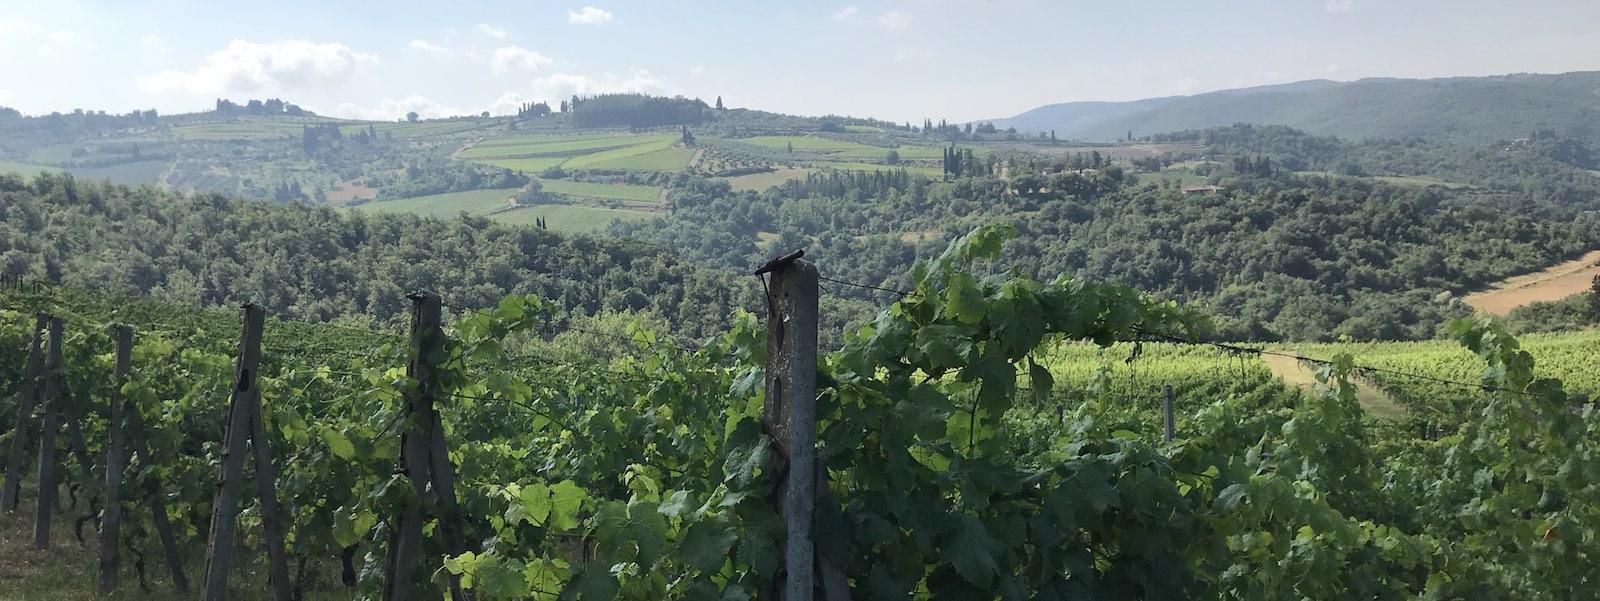 Natural wine vineyards